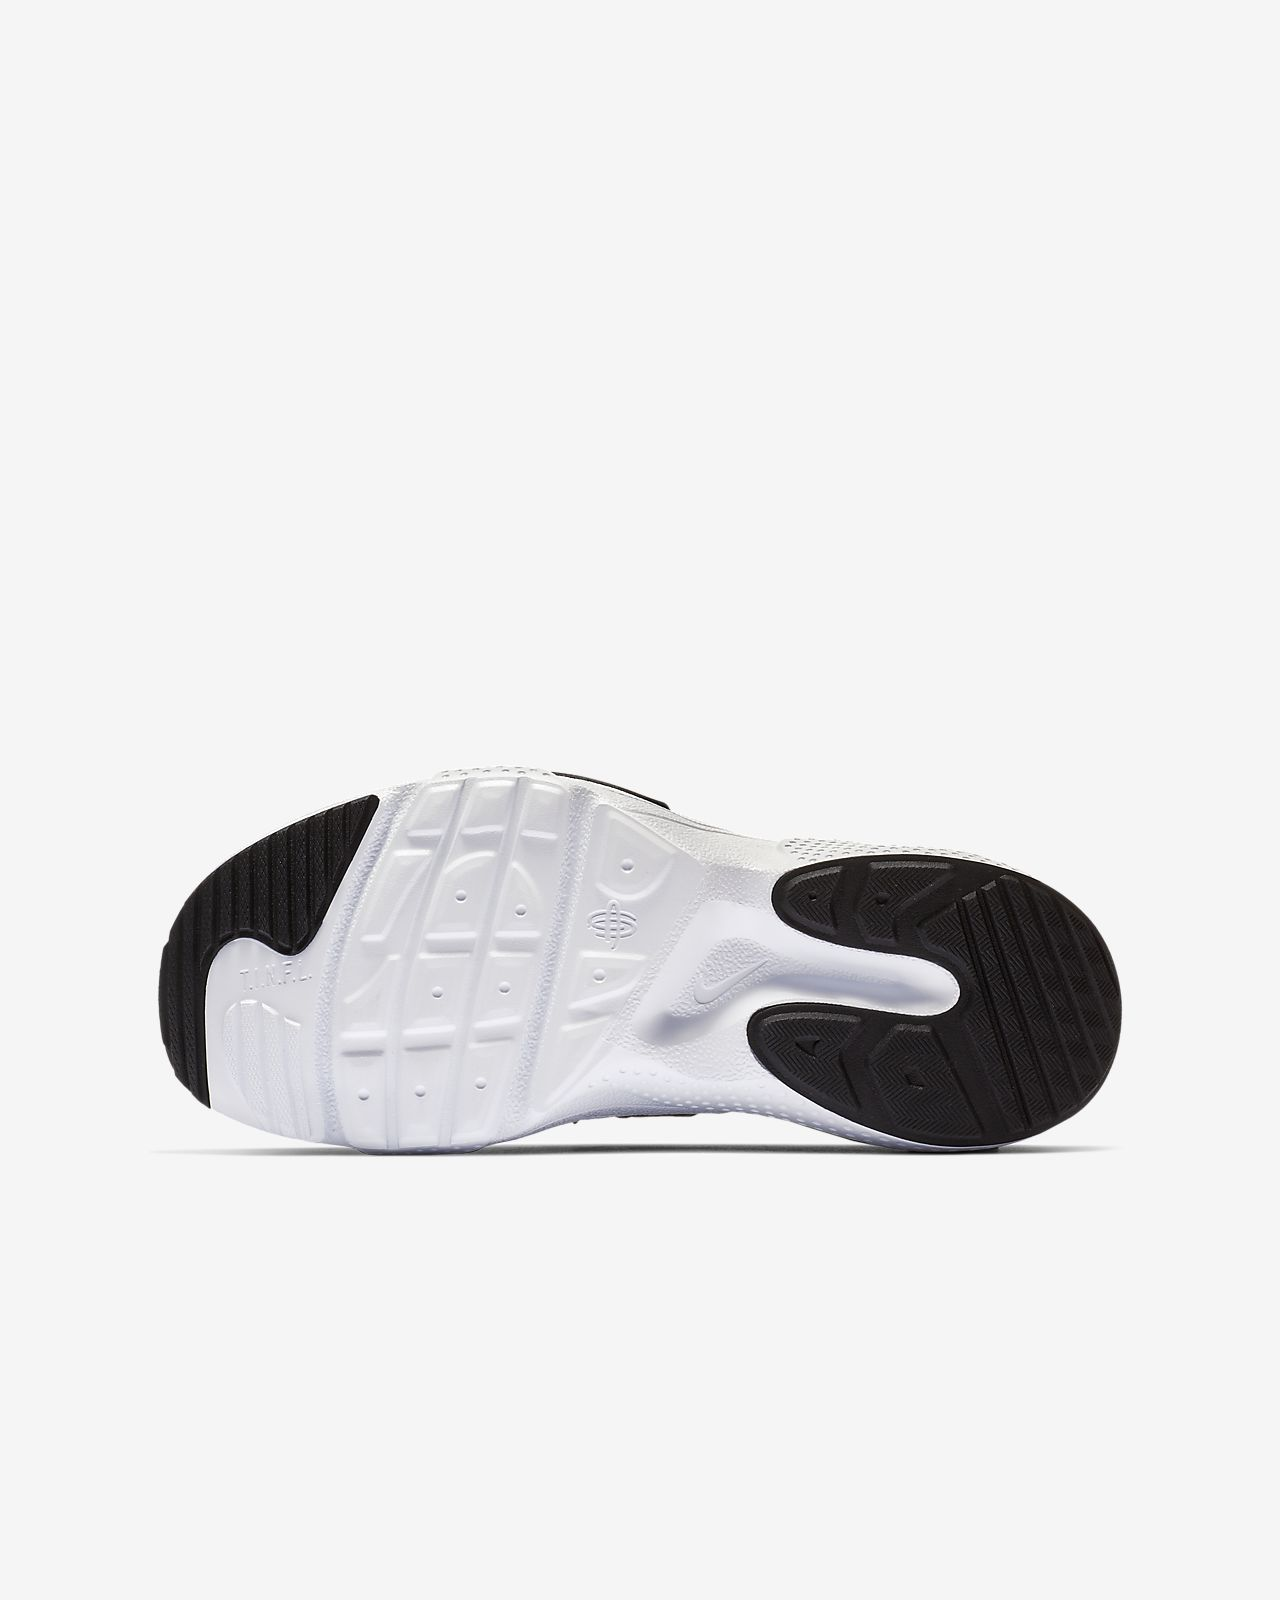 284c10fcfcff7 Nike Huarache E.D.G.E Big Kids  Shoe. Nike.com